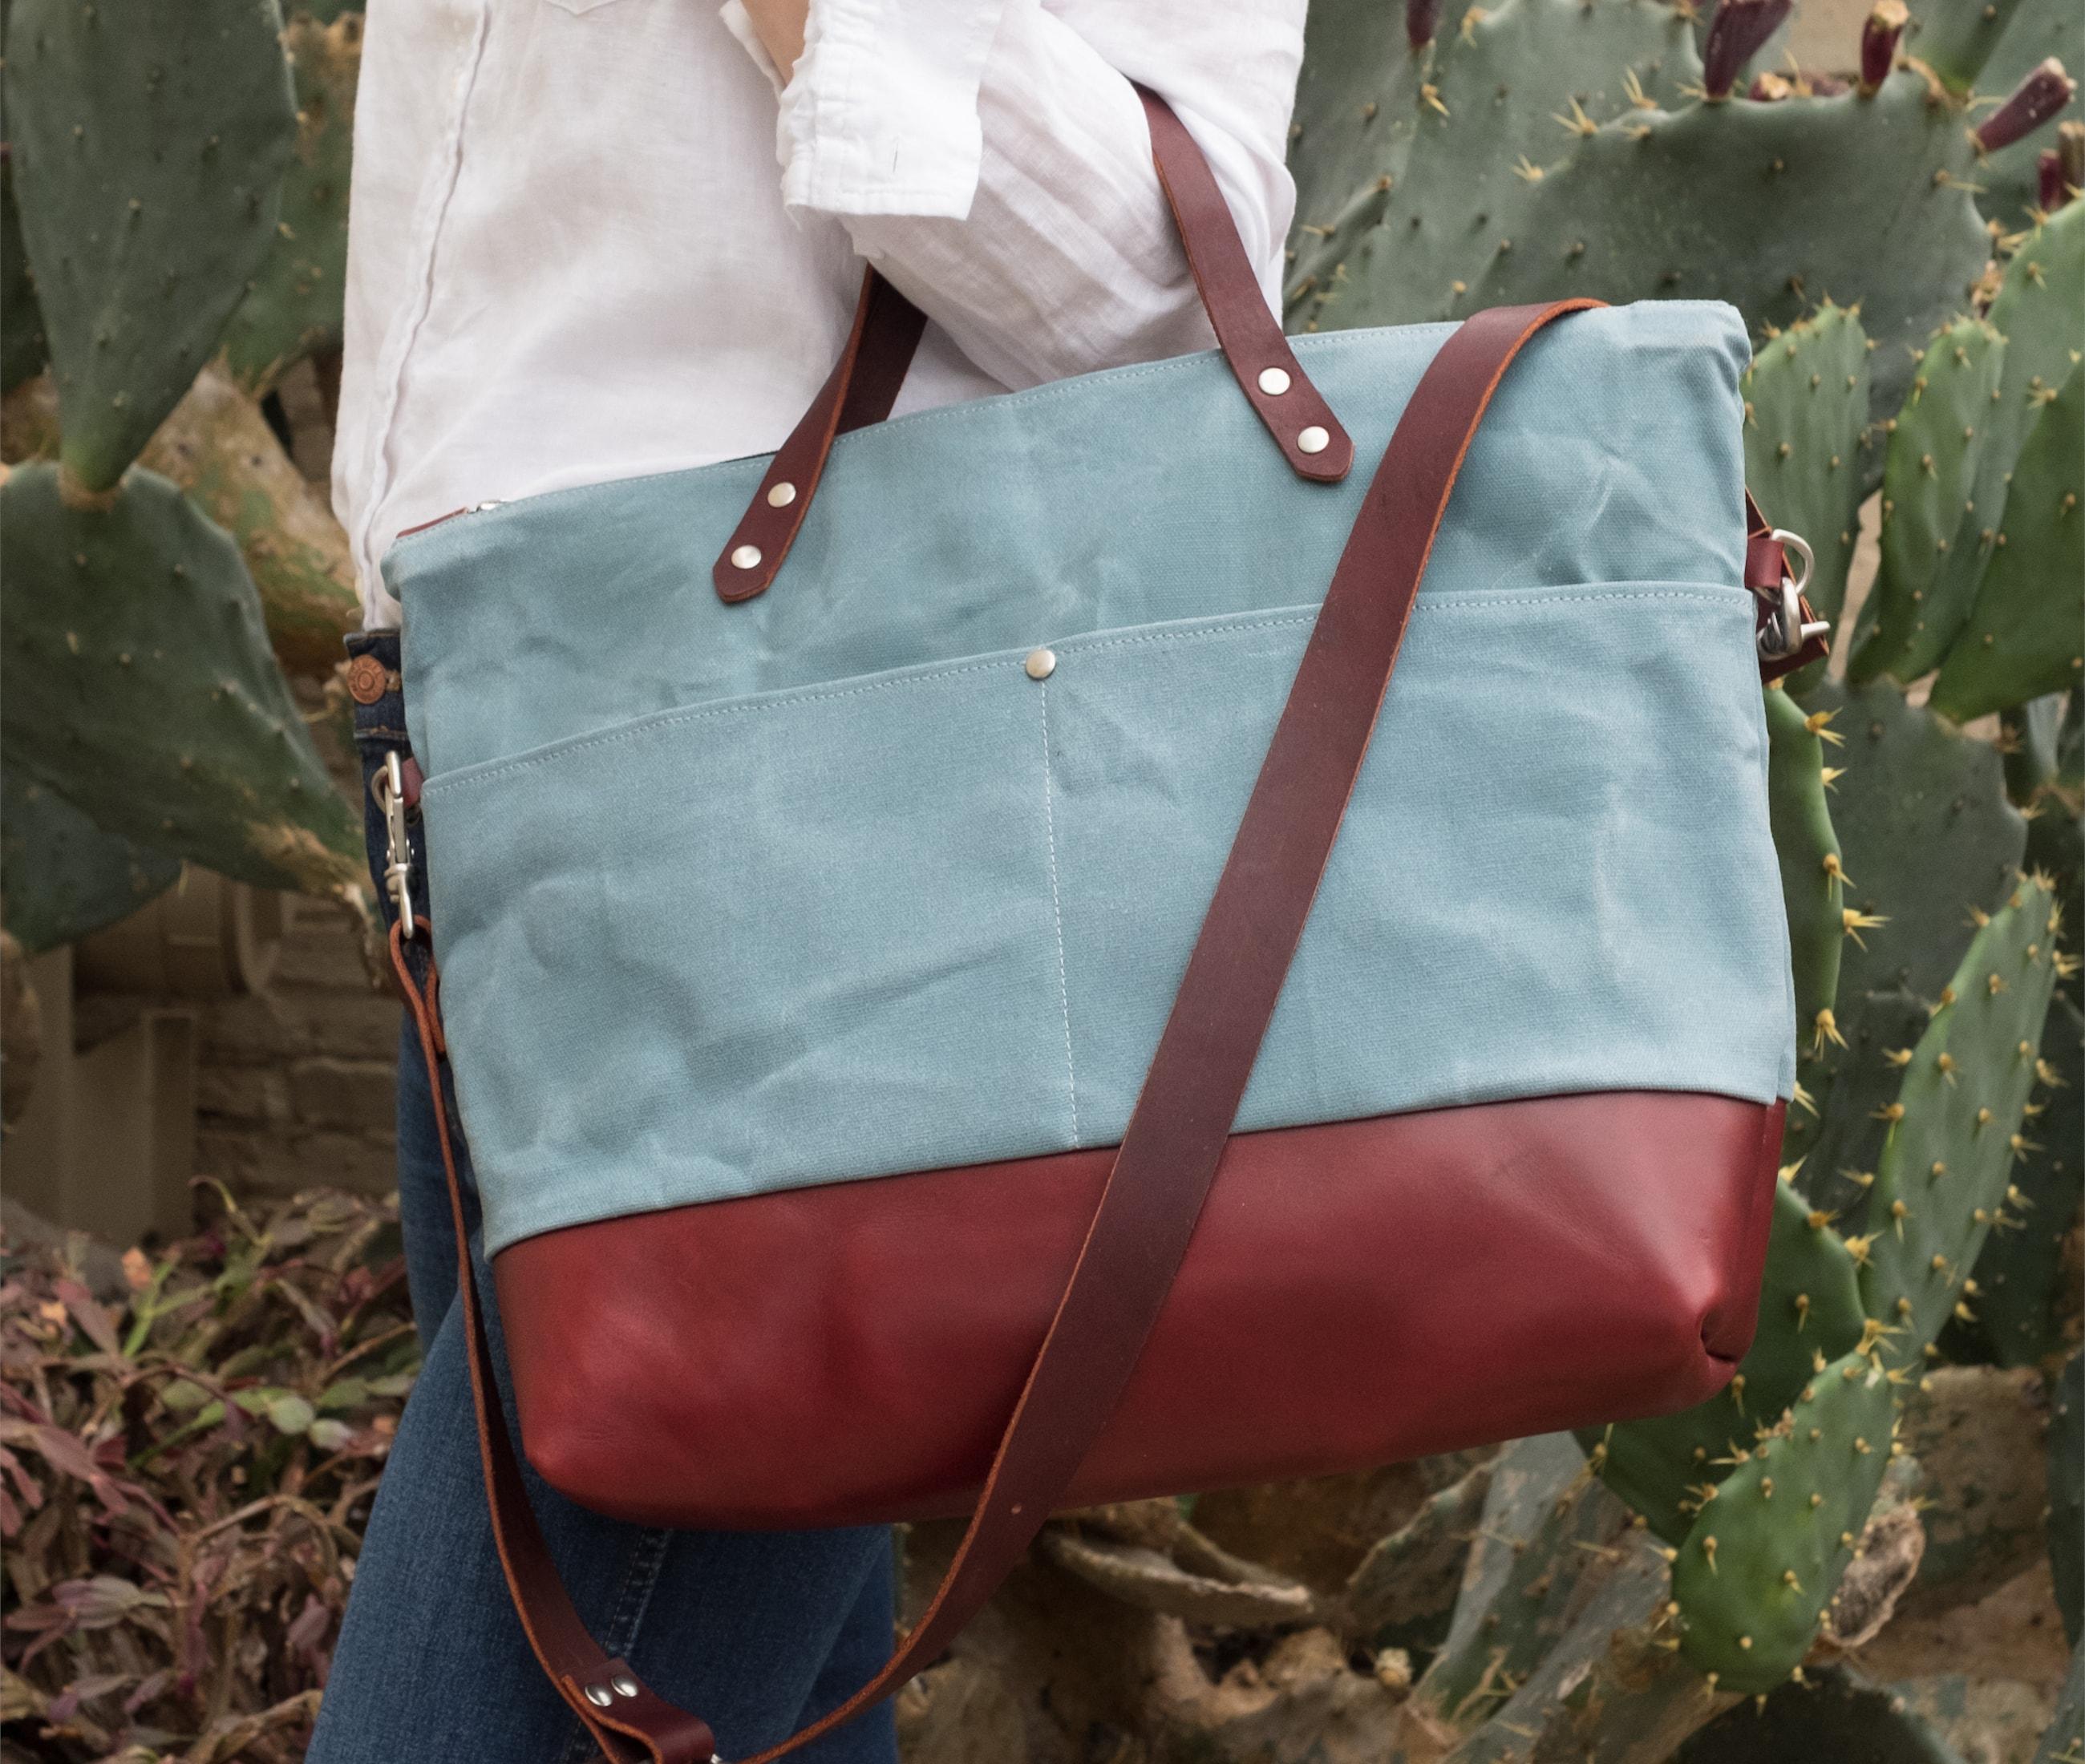 Medium tote cerulean maroon leather lookbook3 by Azellaz